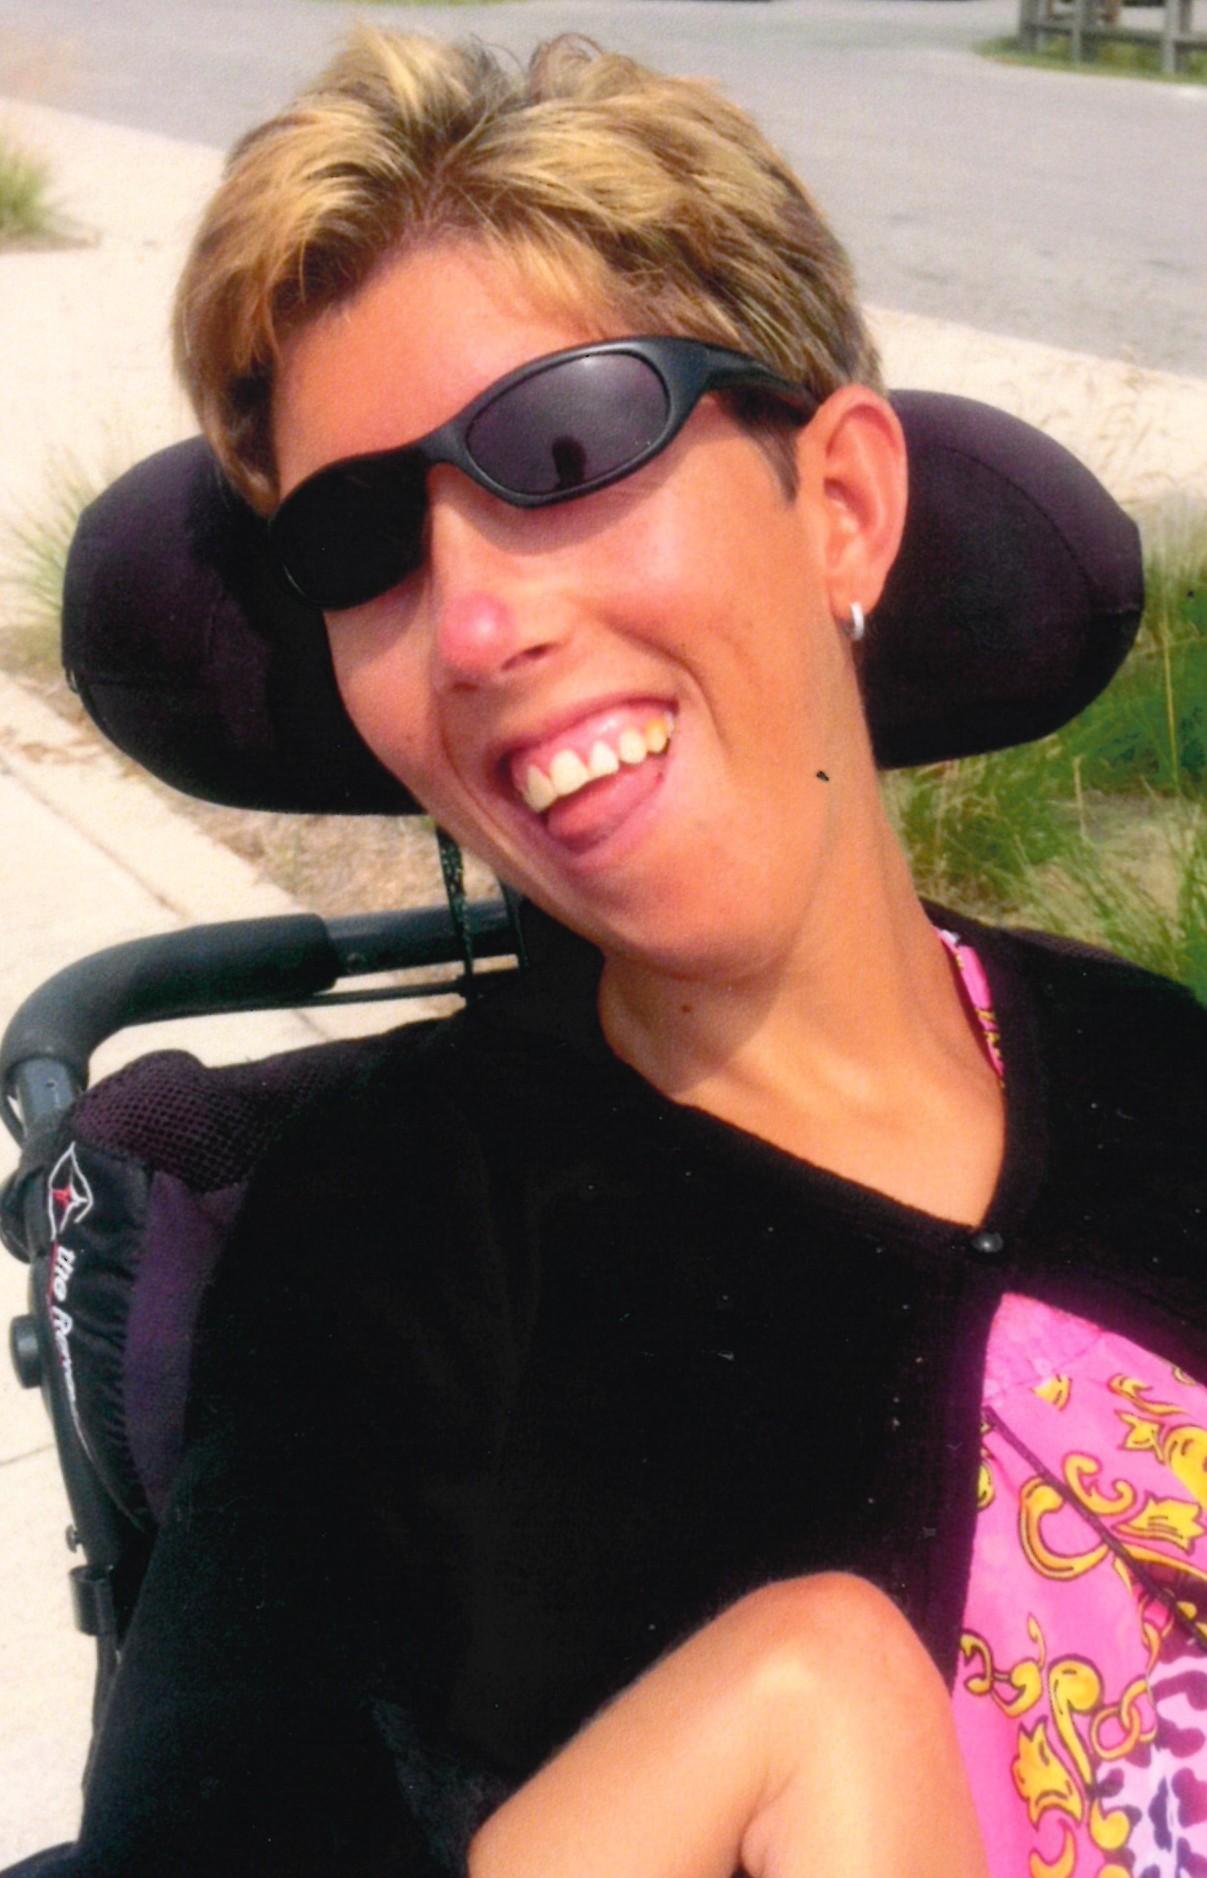 BELL: Brooke Lyndsey of Exeter